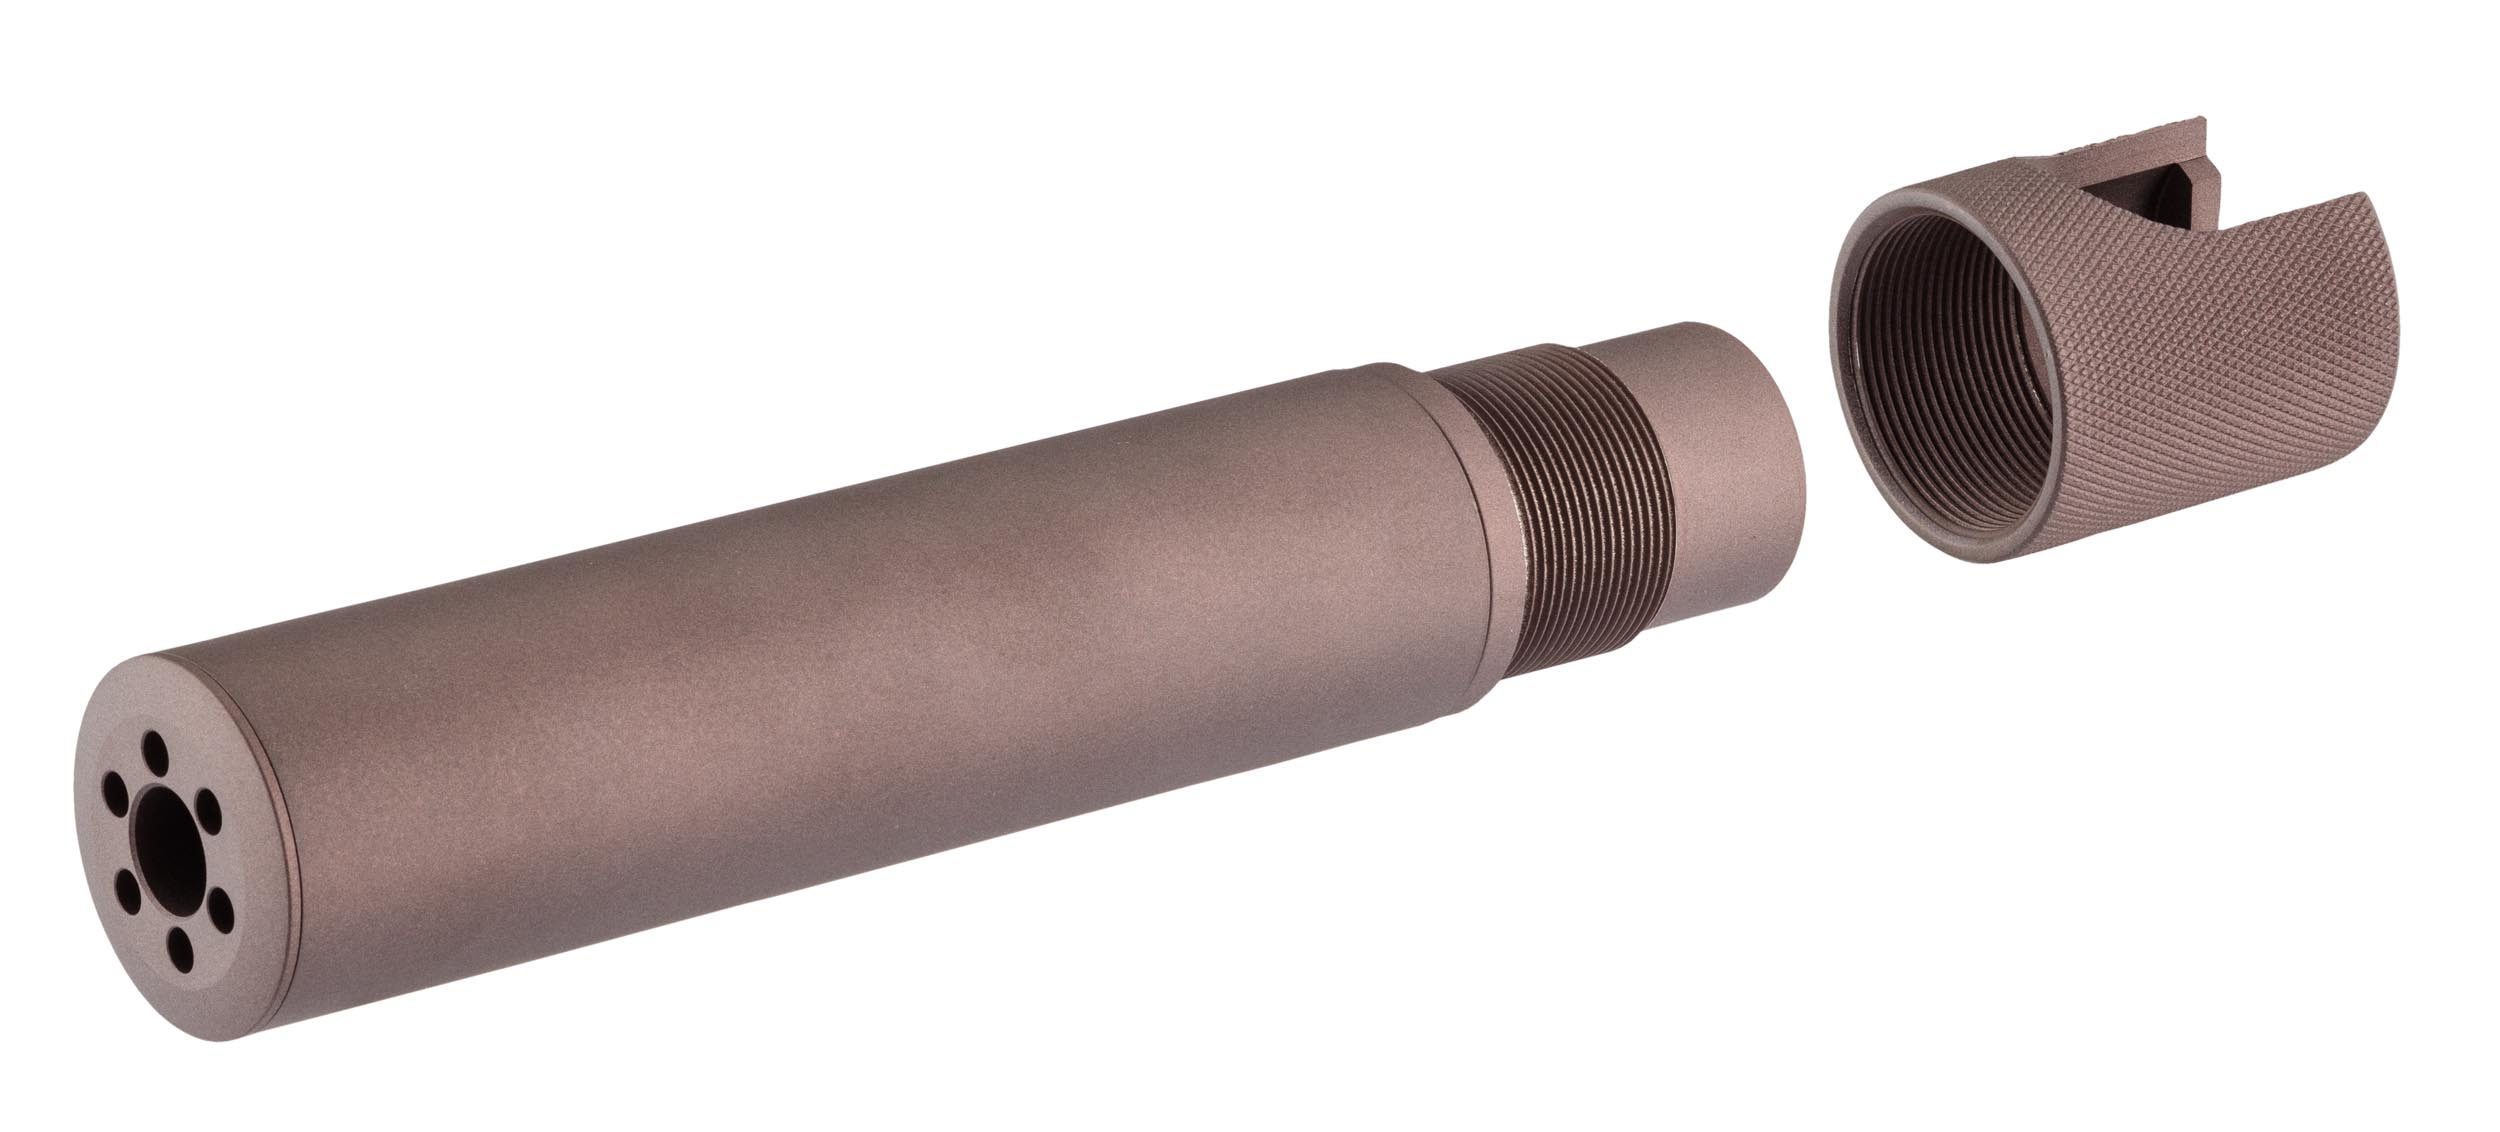 PU02003-1 Gap Style QD Silencer FDE - PU02003